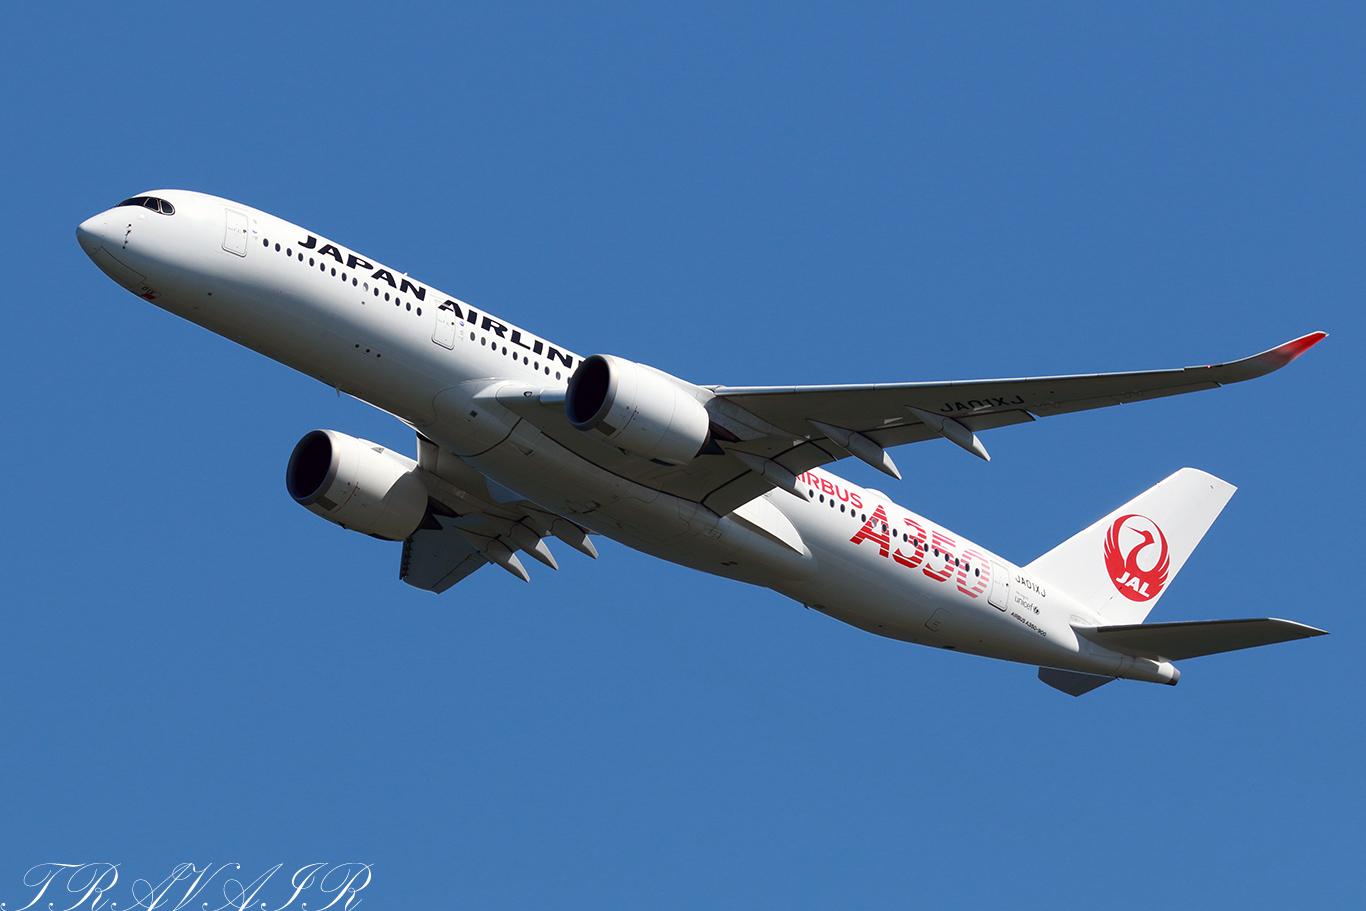 JL/JAL/日本航空 JL515 A350-900 JA01XJ